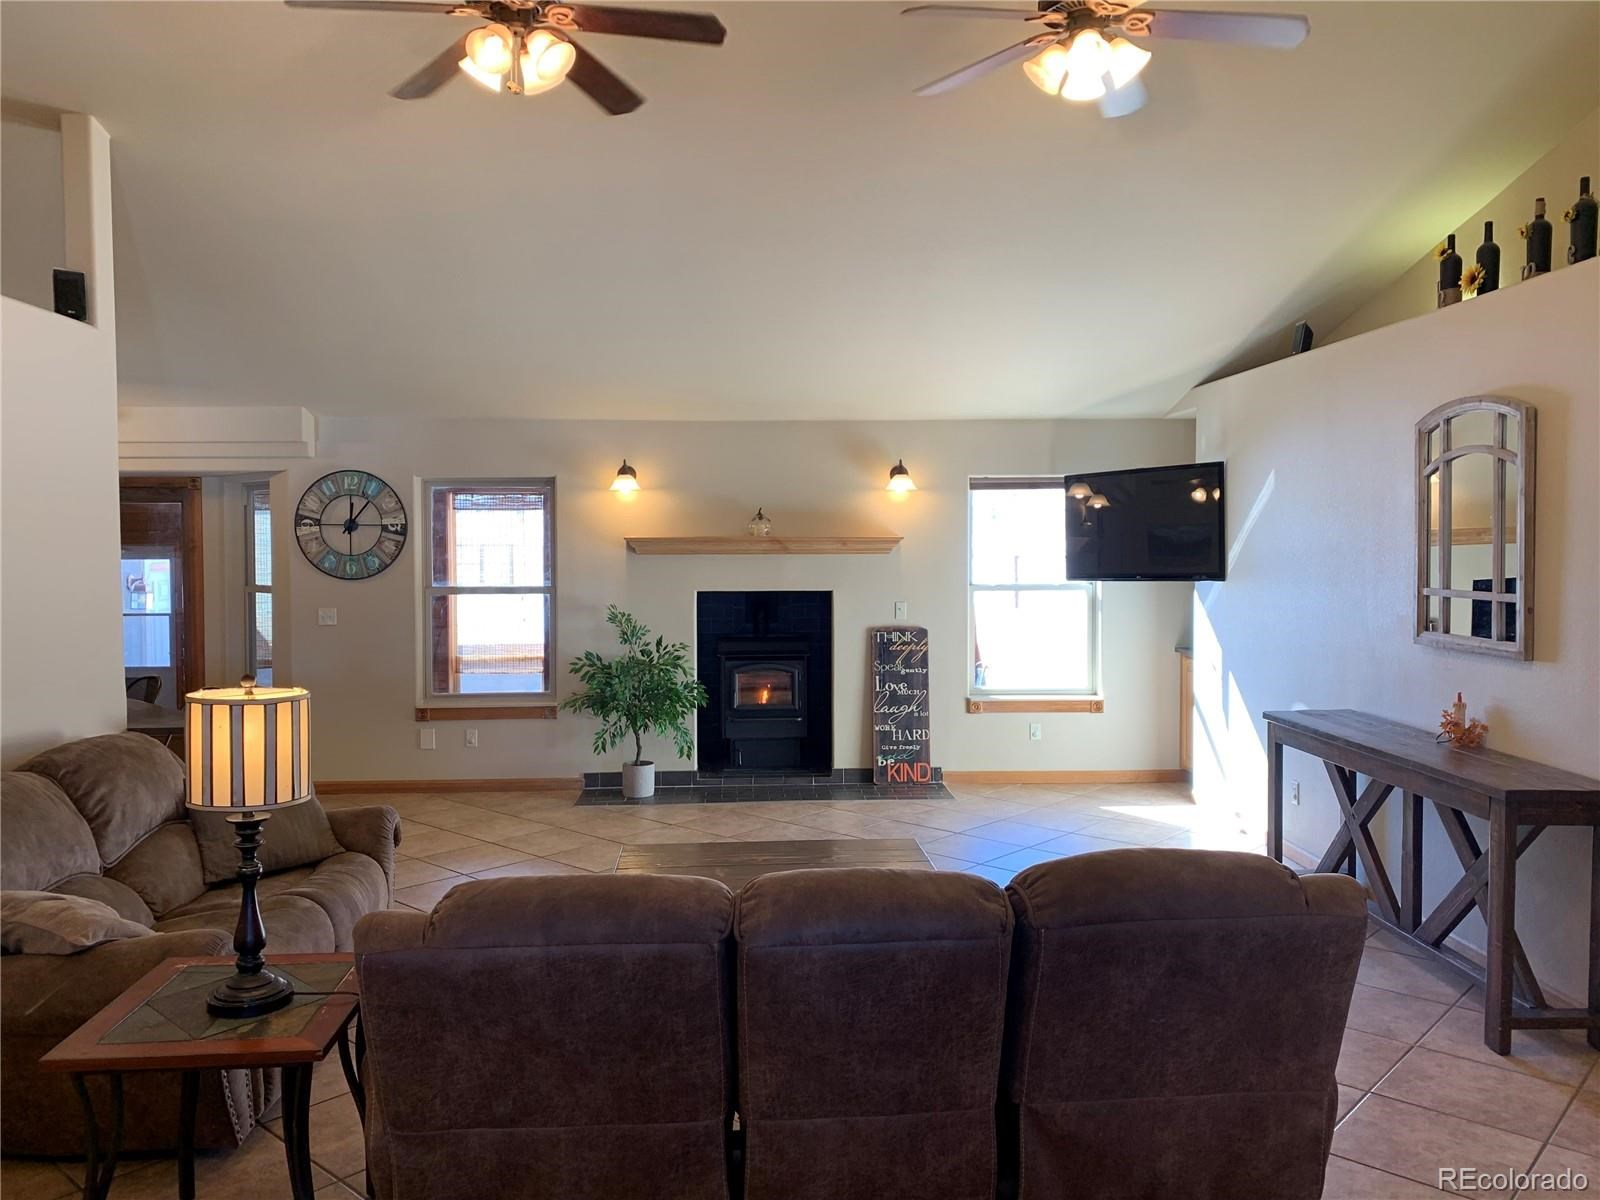 MLS# 7097007 - 4 - 27635 Rancho Sawatch , Buena Vista, CO 81211